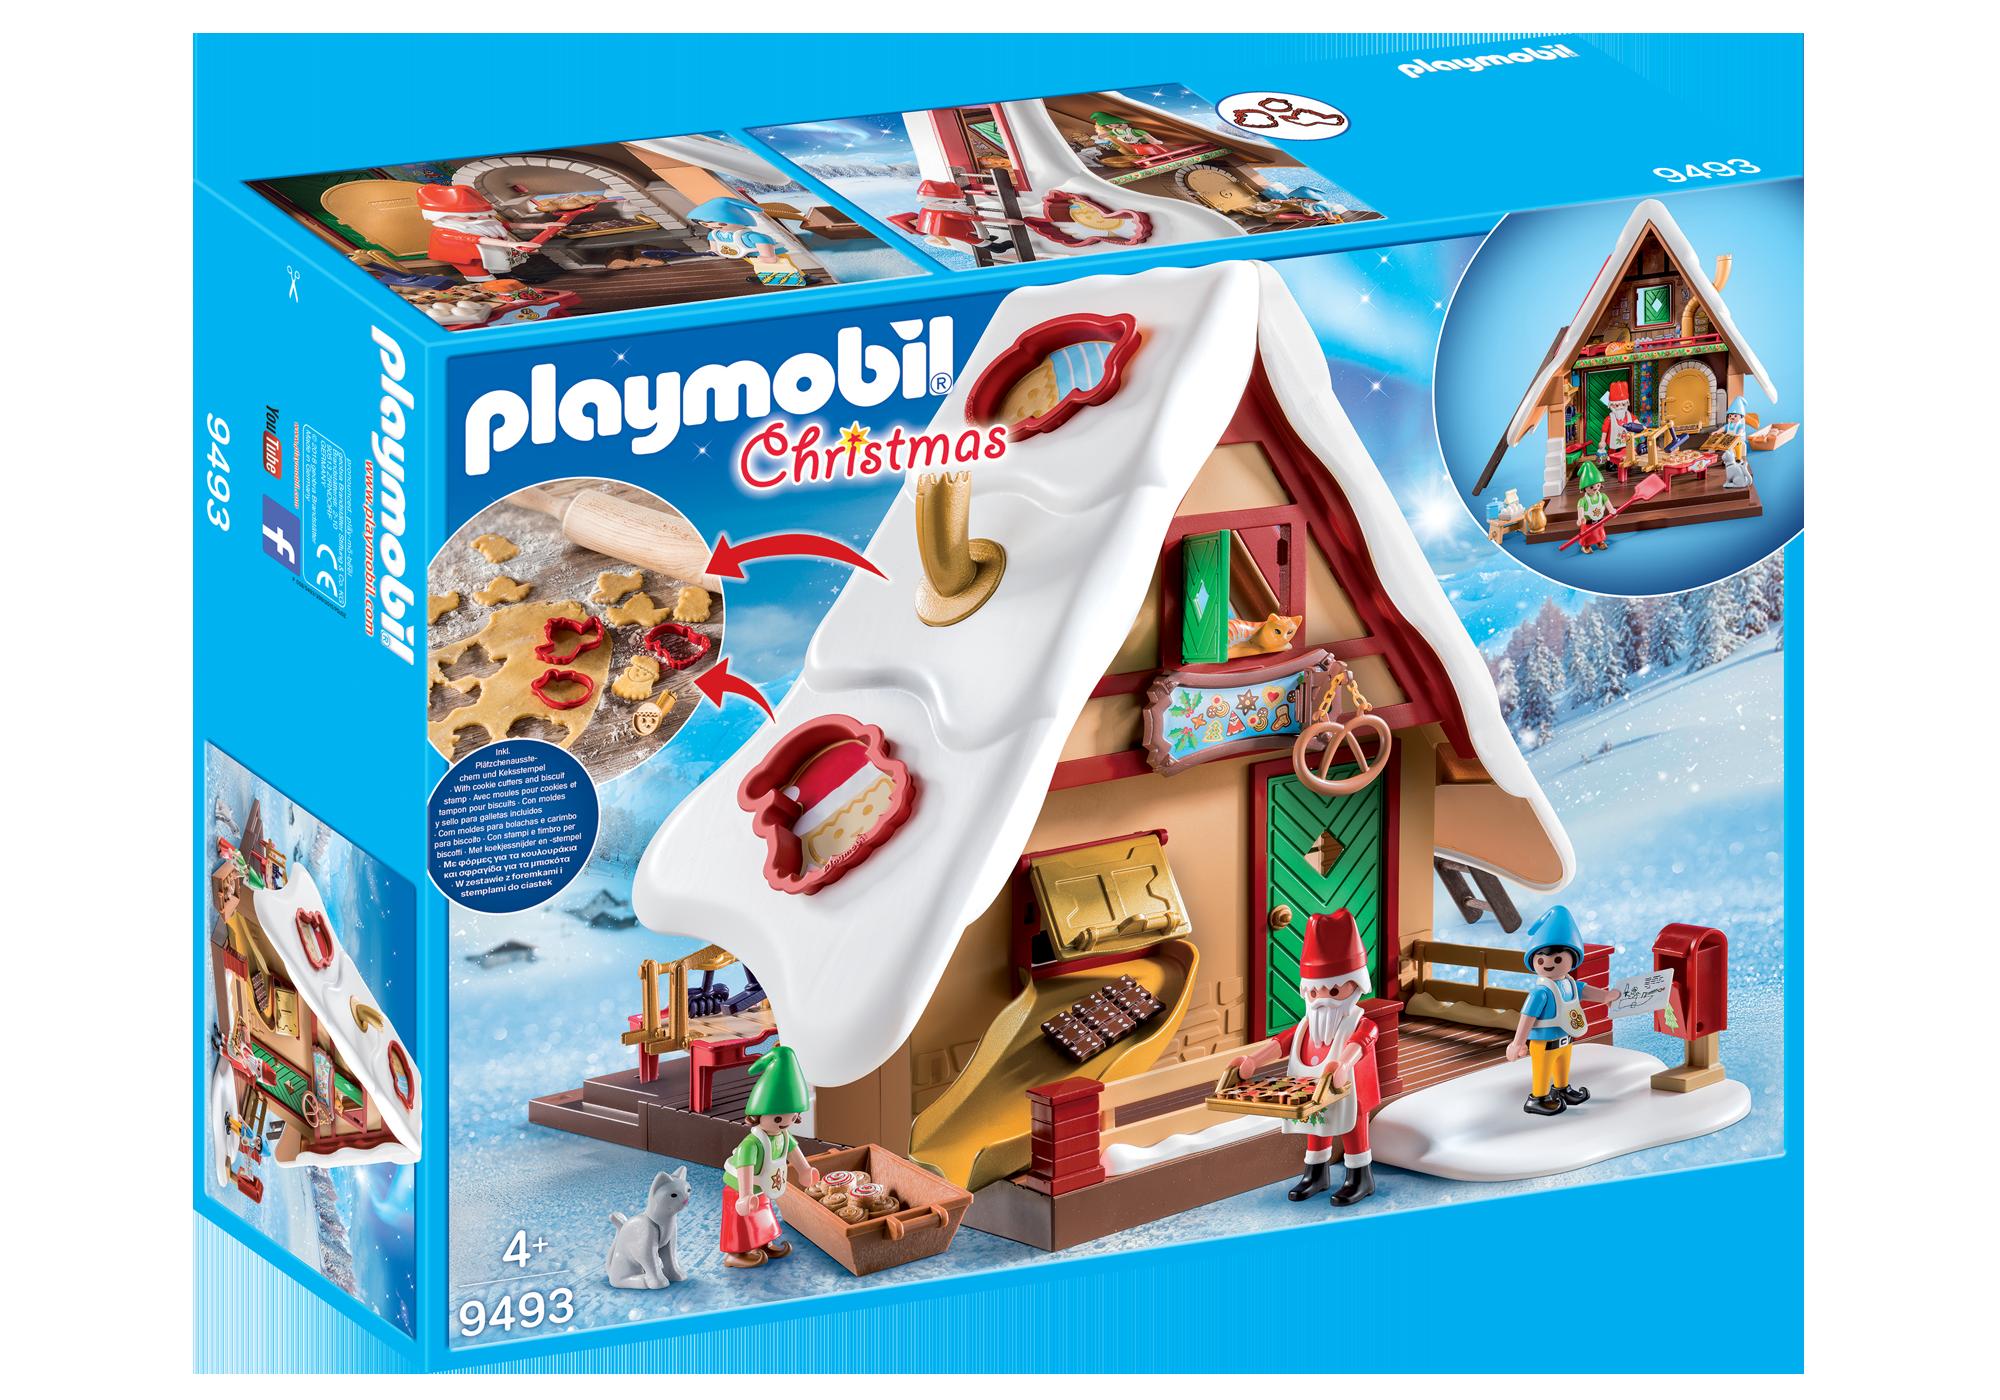 http://media.playmobil.com/i/playmobil/9493_product_box_front/Julebageri med småkageskærere